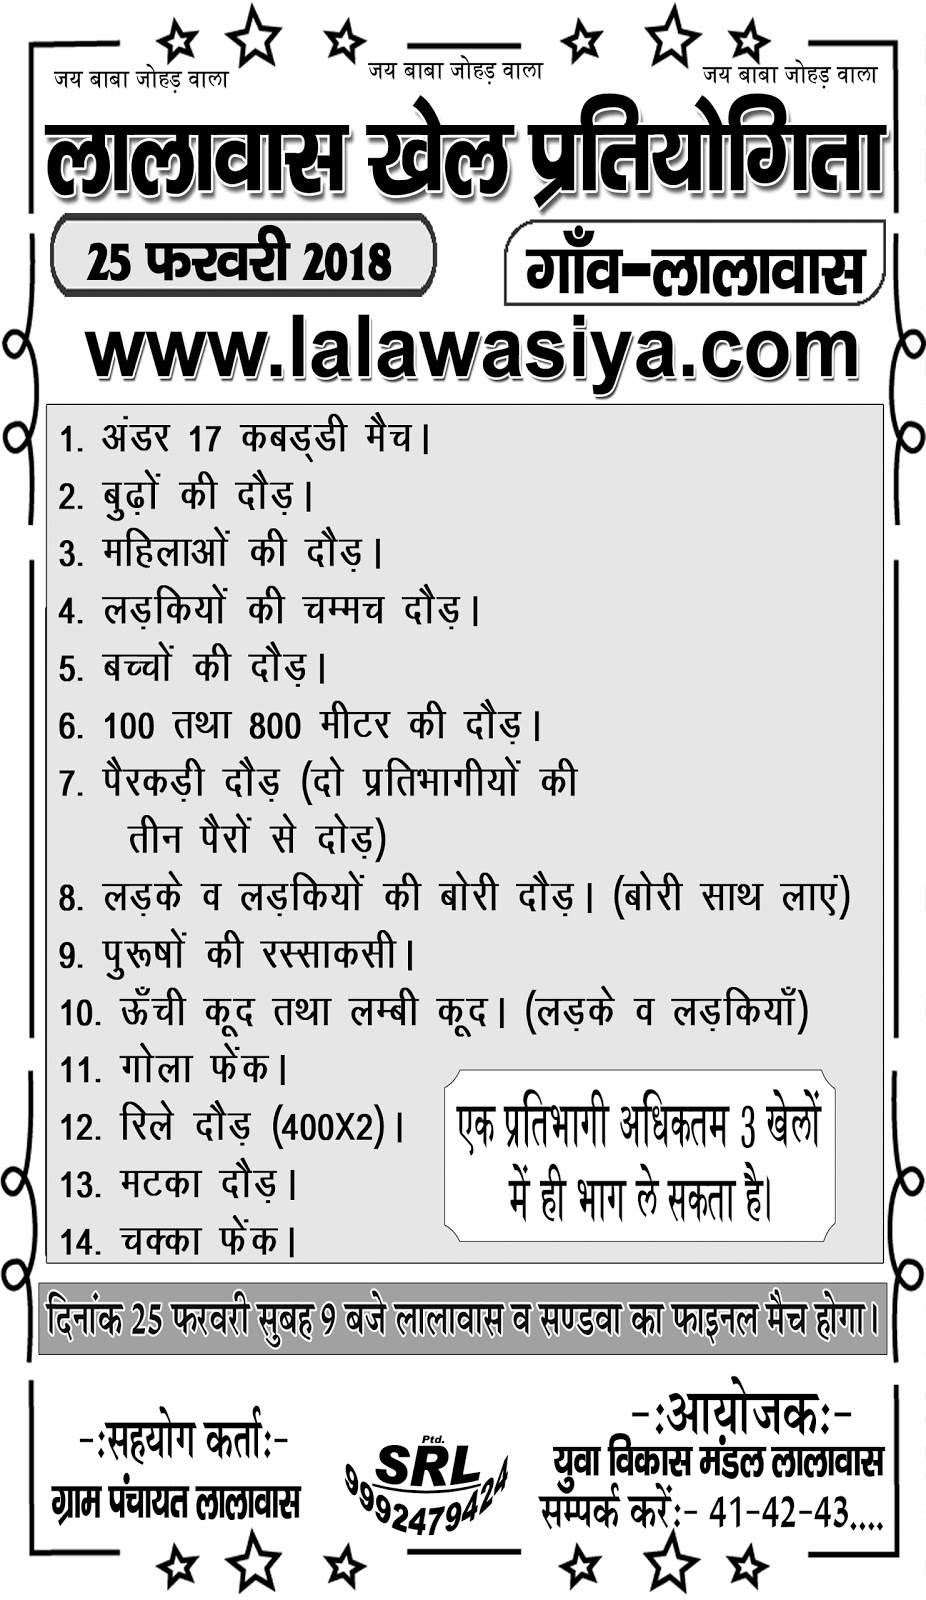 http://www.lalawasiya.com/